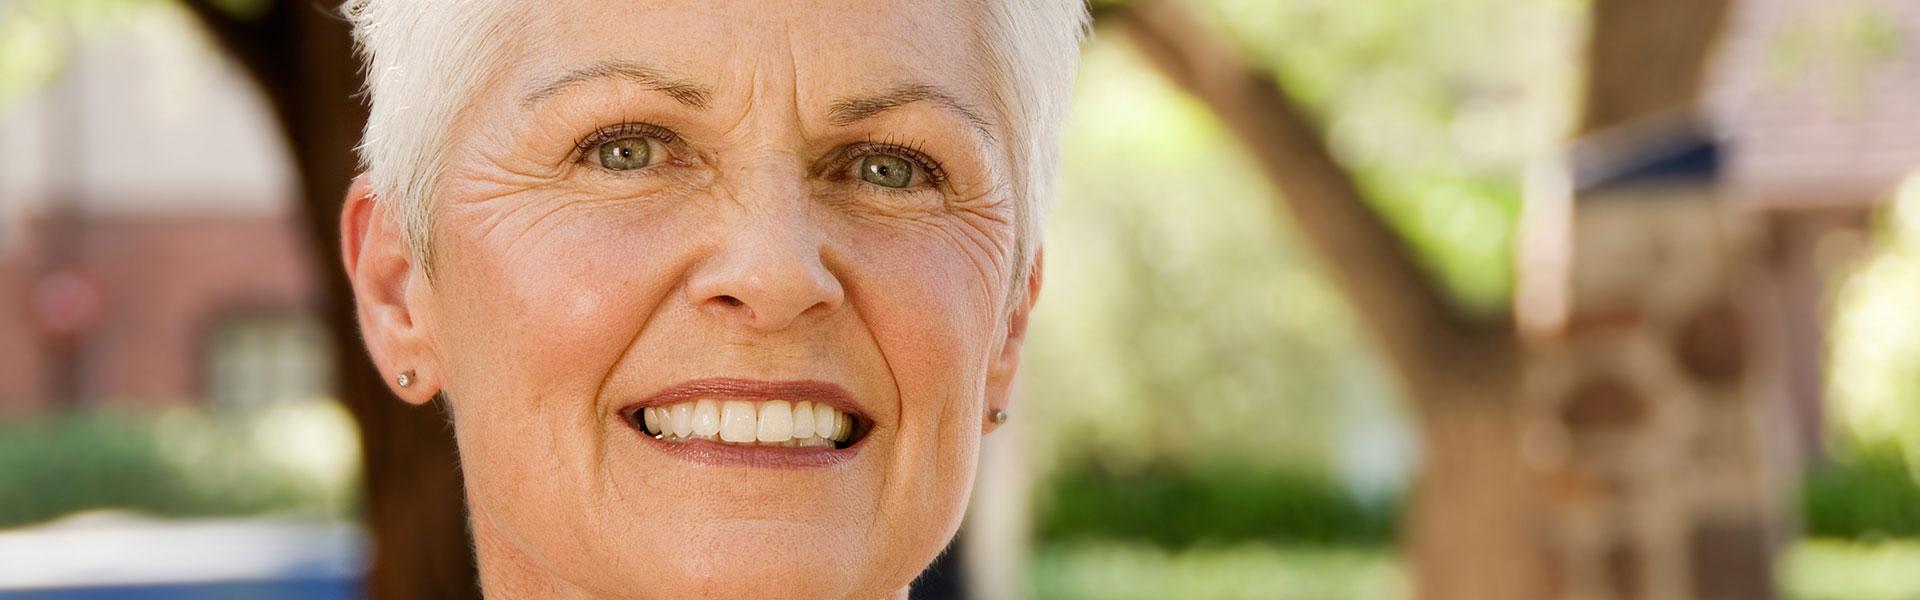 senior woman with perfect smile